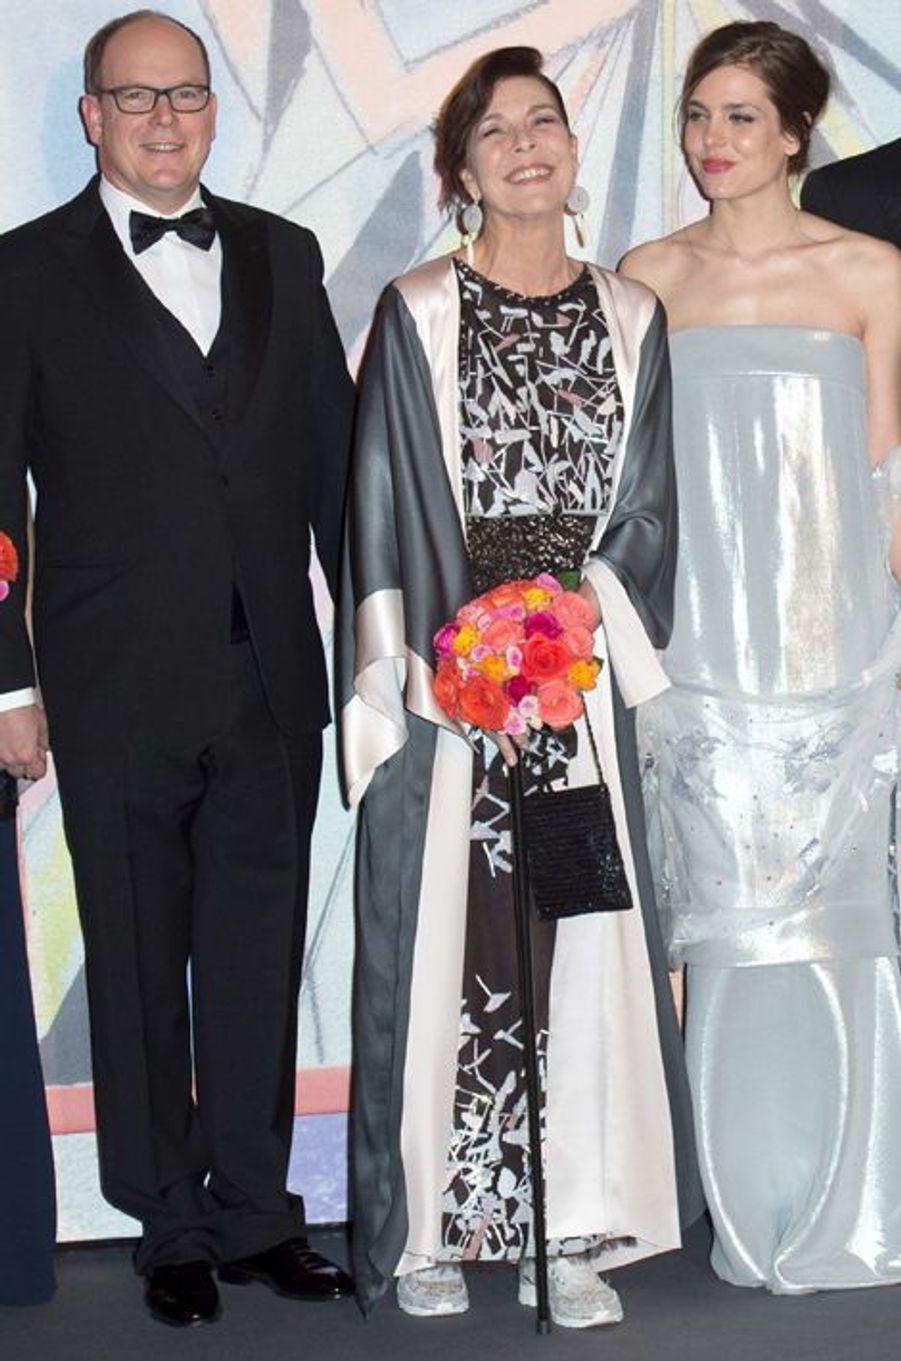 La princesse Caroline de Monaco au bal de la Rose 2014, avec le prince Albert II et Charlotte Casiraghi